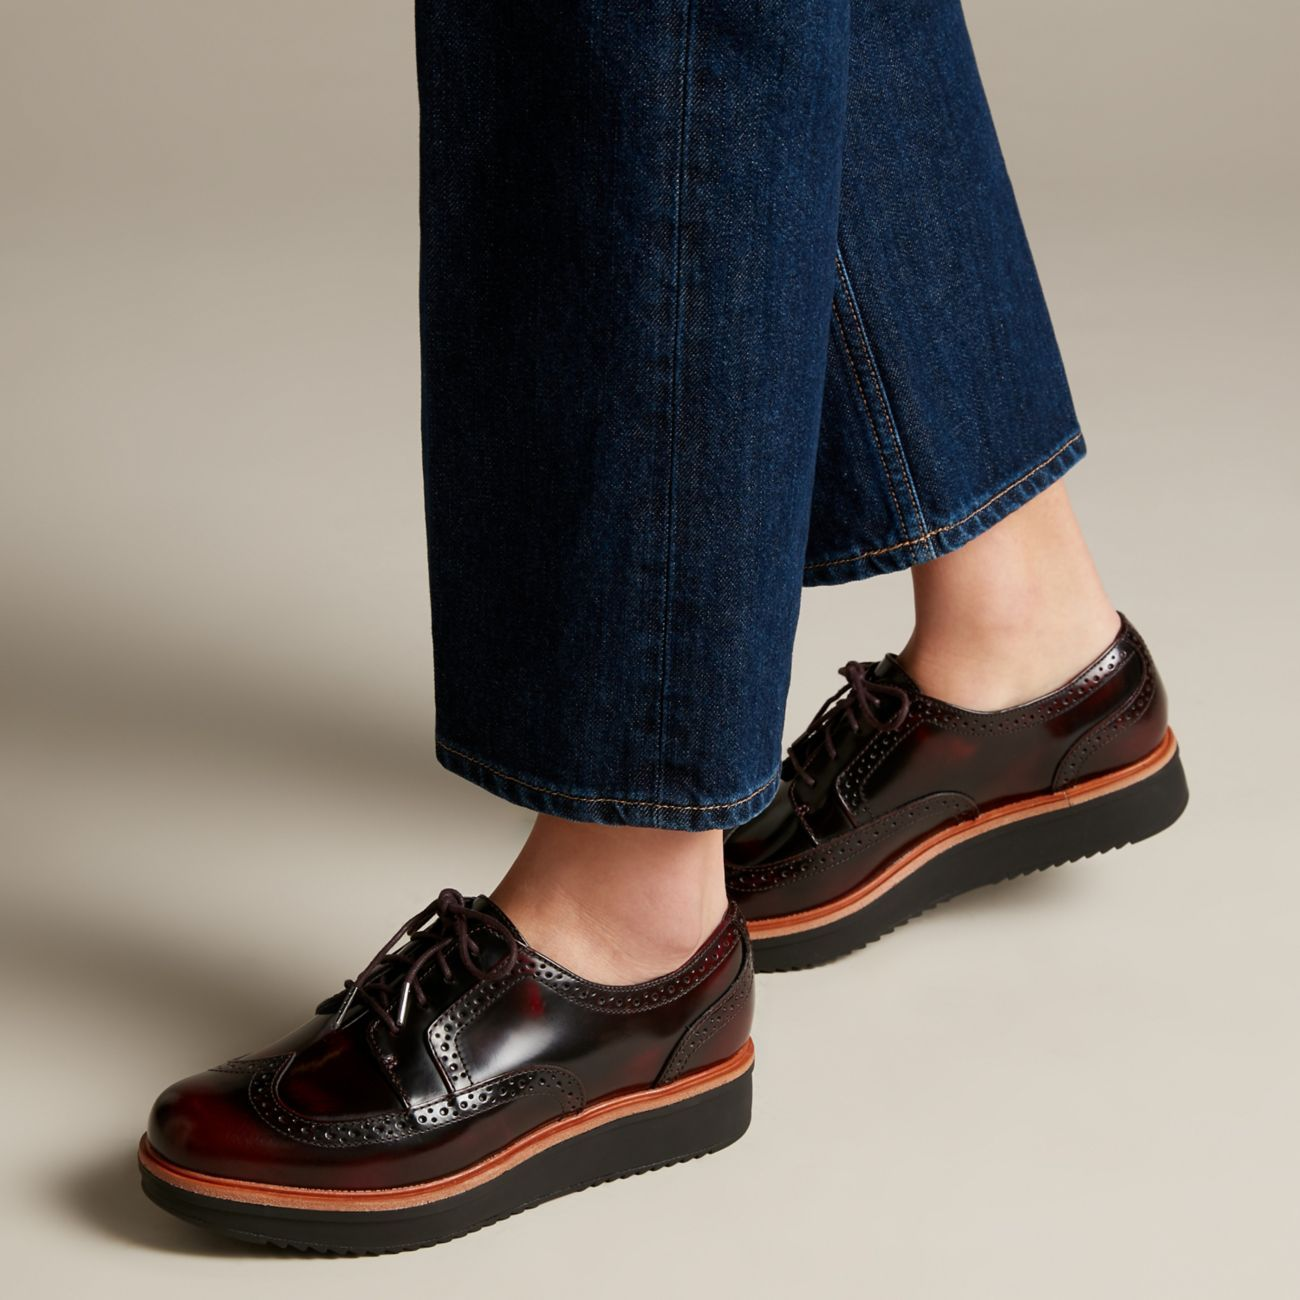 Brogue oxford shoes, Ladies brogues